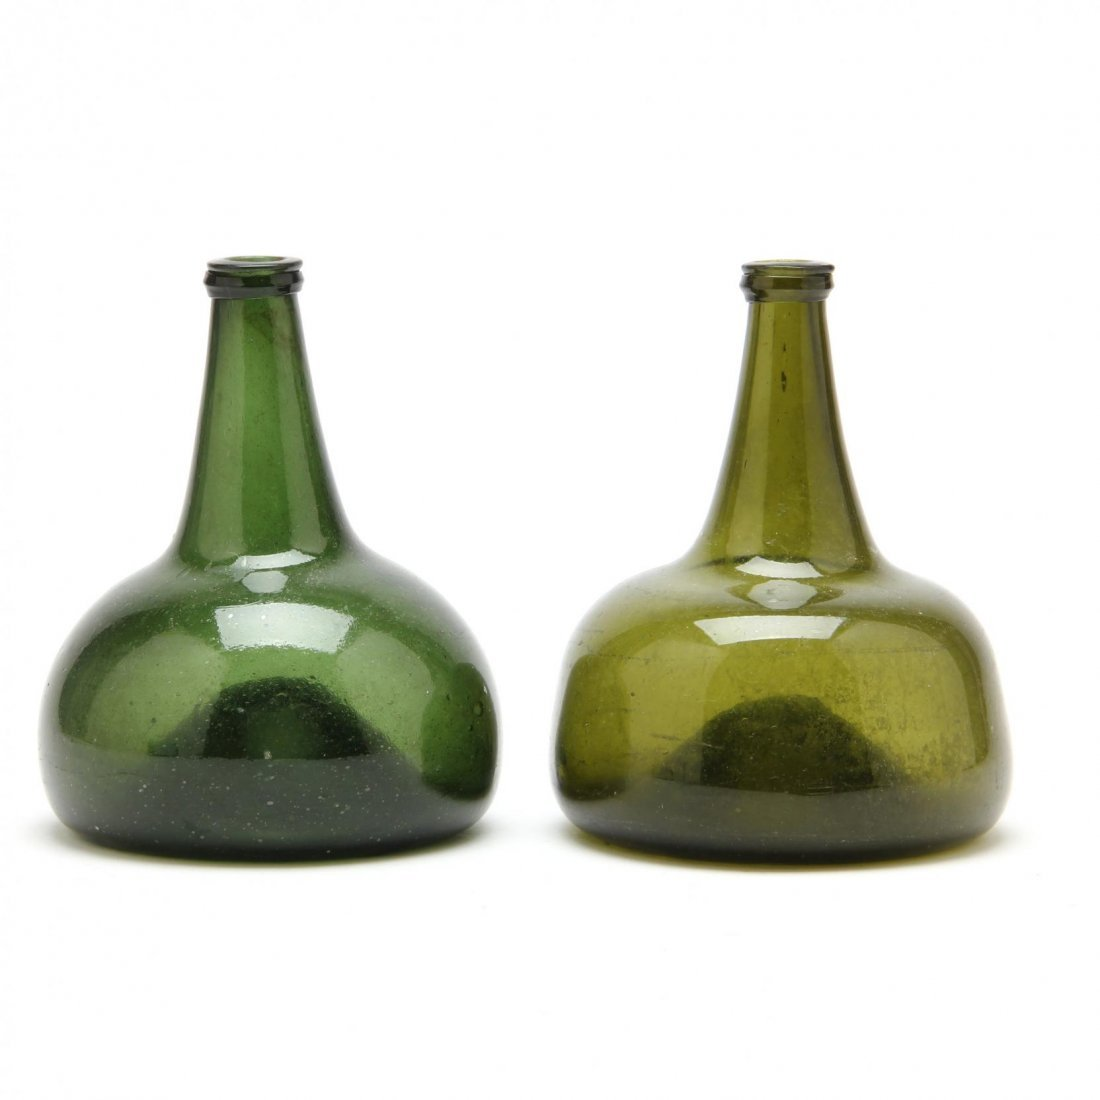 Pair of 18th Century Onion Bottles